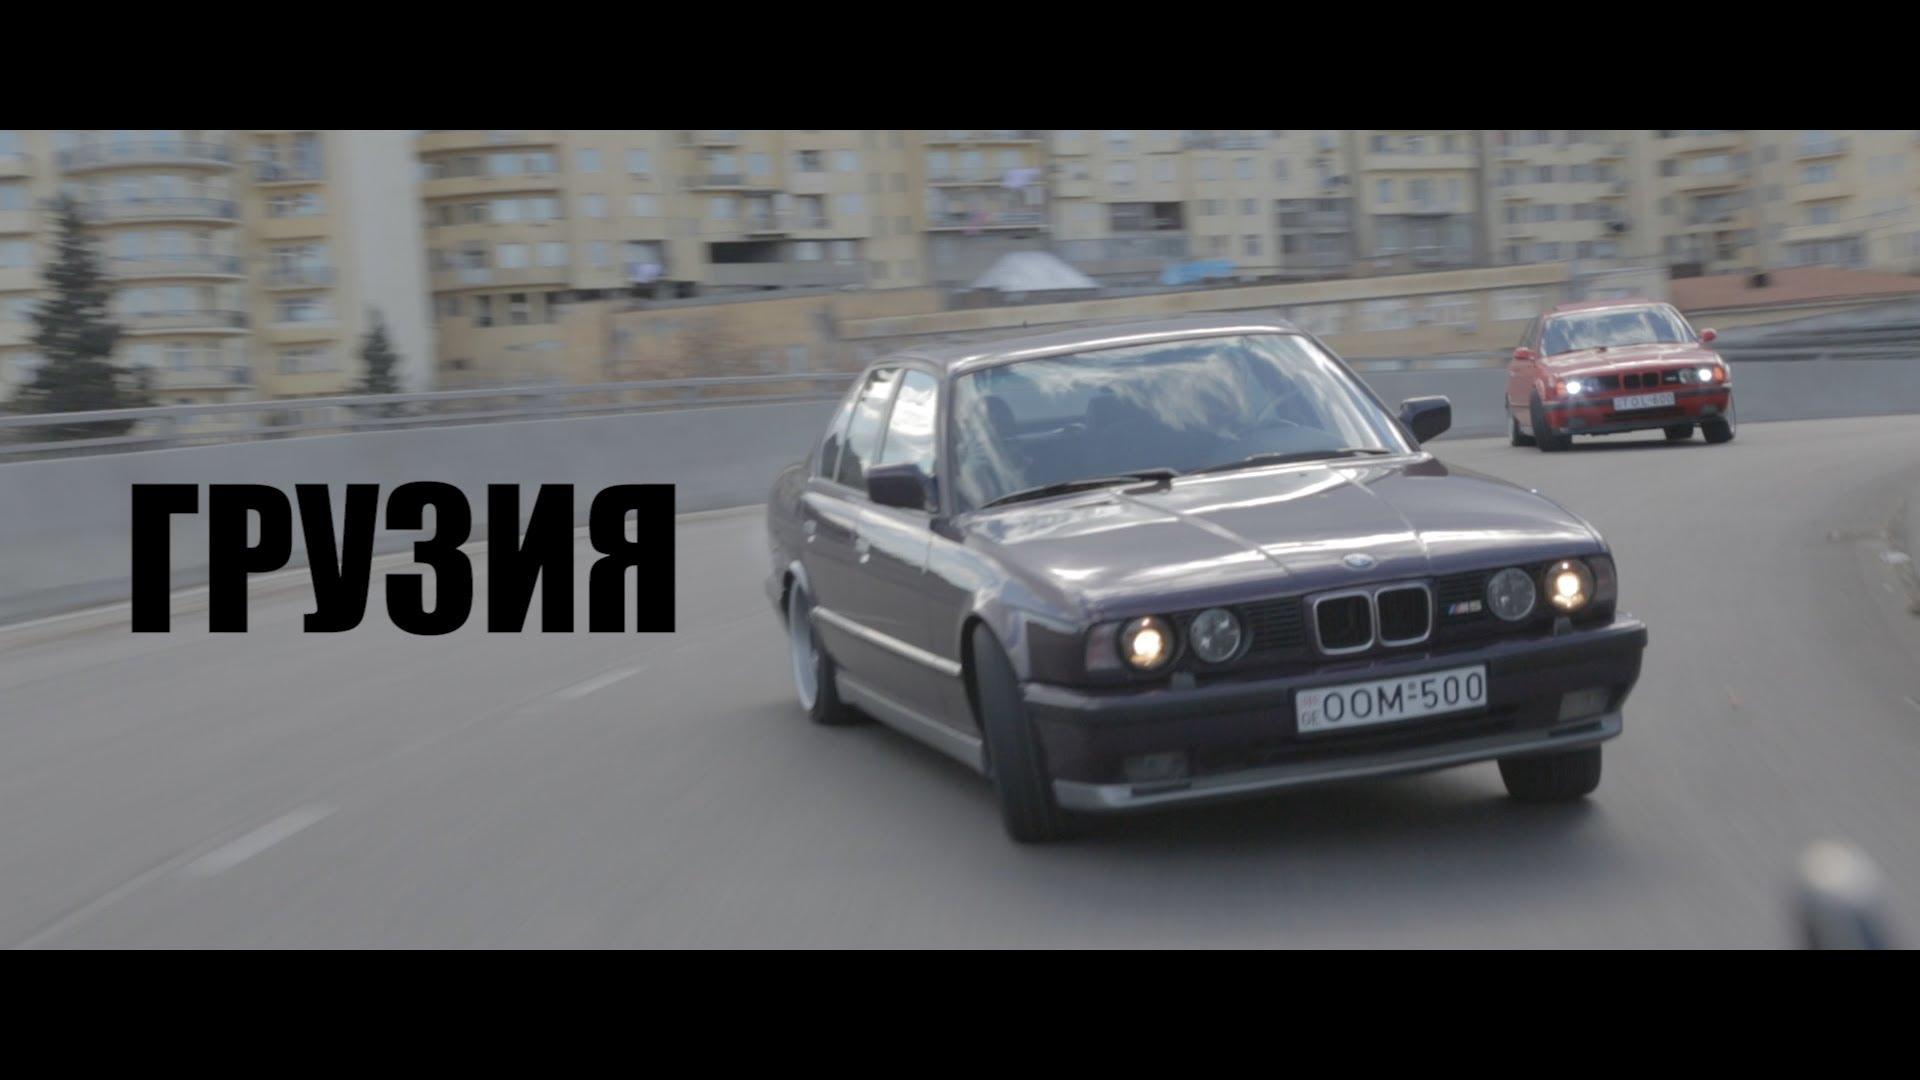 Giorgi Tevzadze Bmw M5 Illegal Street Racing